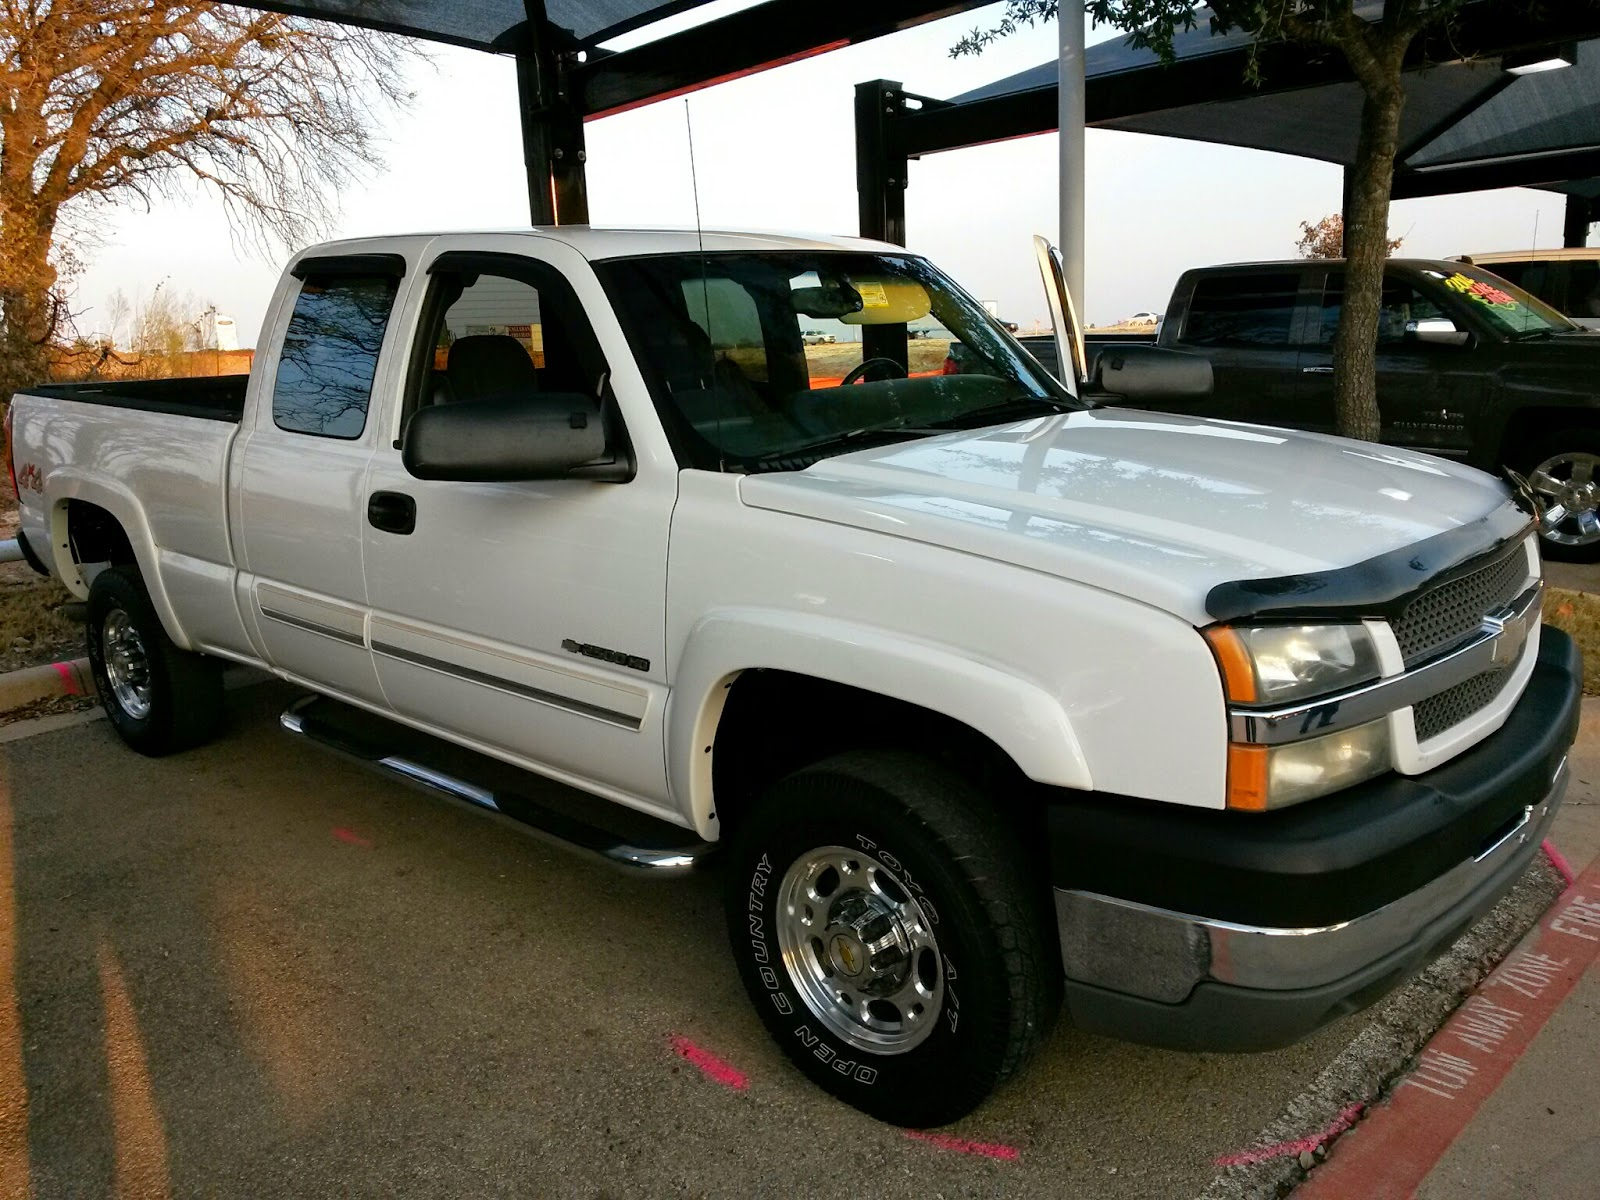 For Sale $15 991 white 2004 Chevrolet Silverado 2500 4x4 6 0 Gas 70k